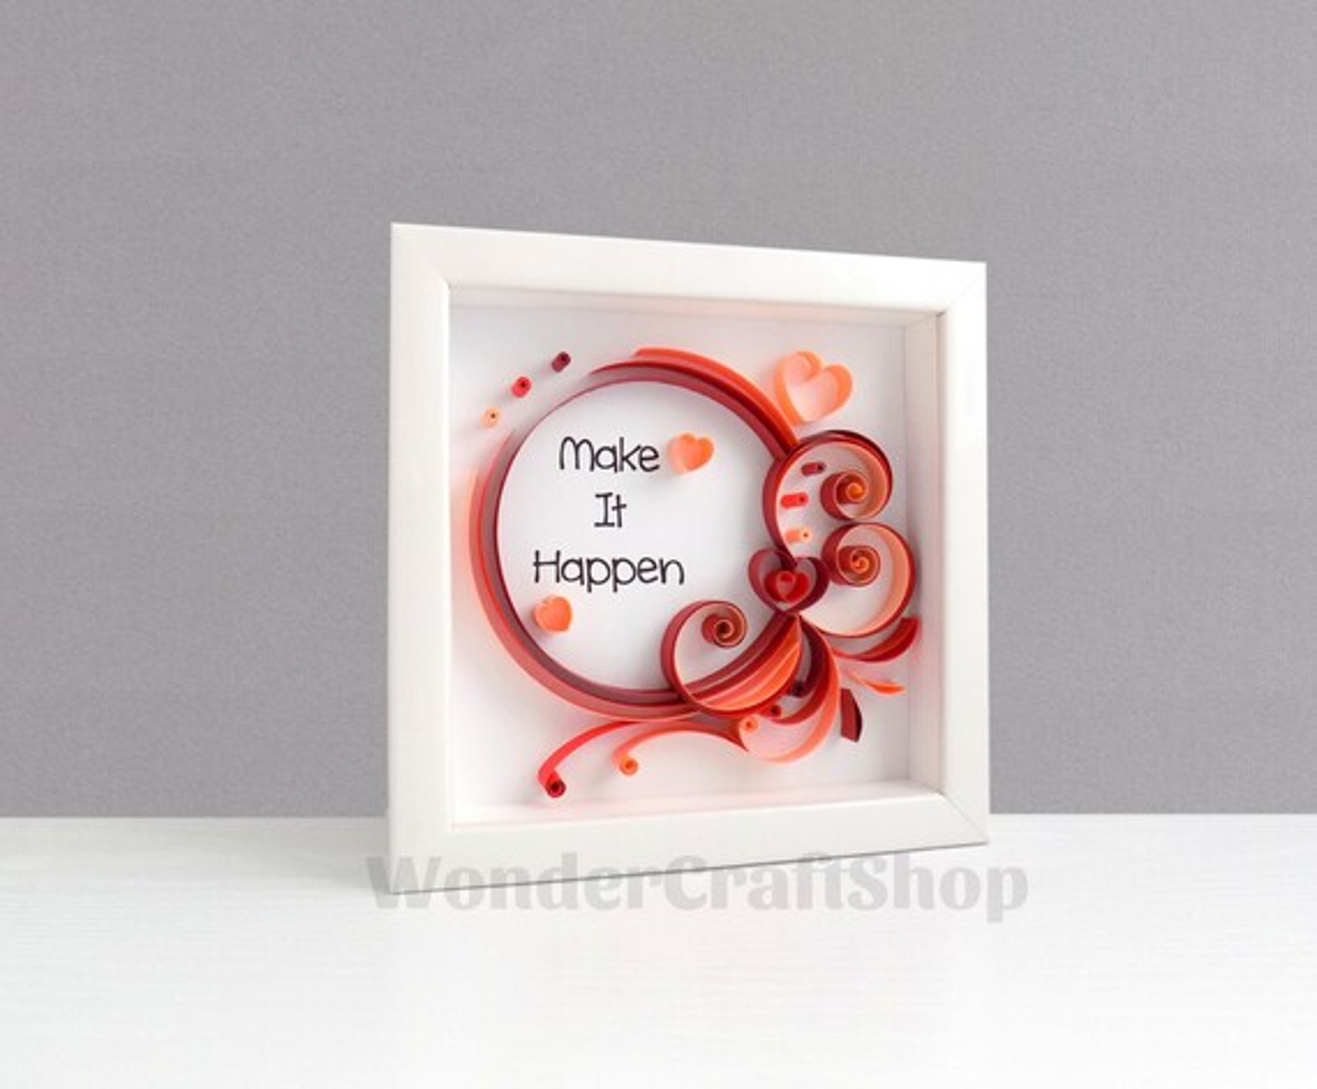 Make It Happen Quote, New Job Gift, Job Promotion Gift, Inspirational  Quote, Motivational Quote, Gift for Employee Employer, 3D Wall Art